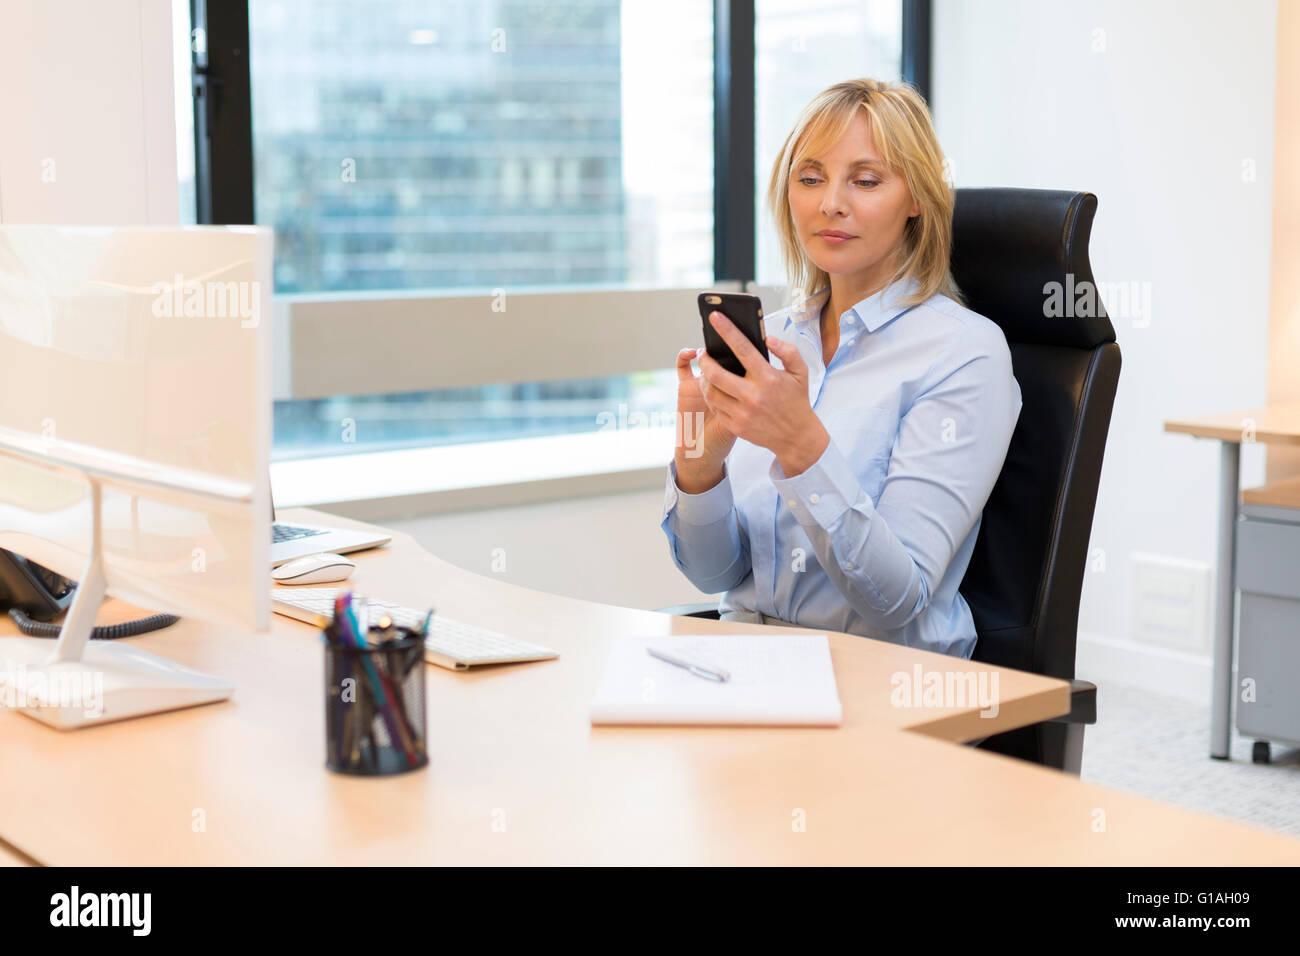 Applying Geschaftsfrau Die Im Buro Arbeiten Mittels Smartphone